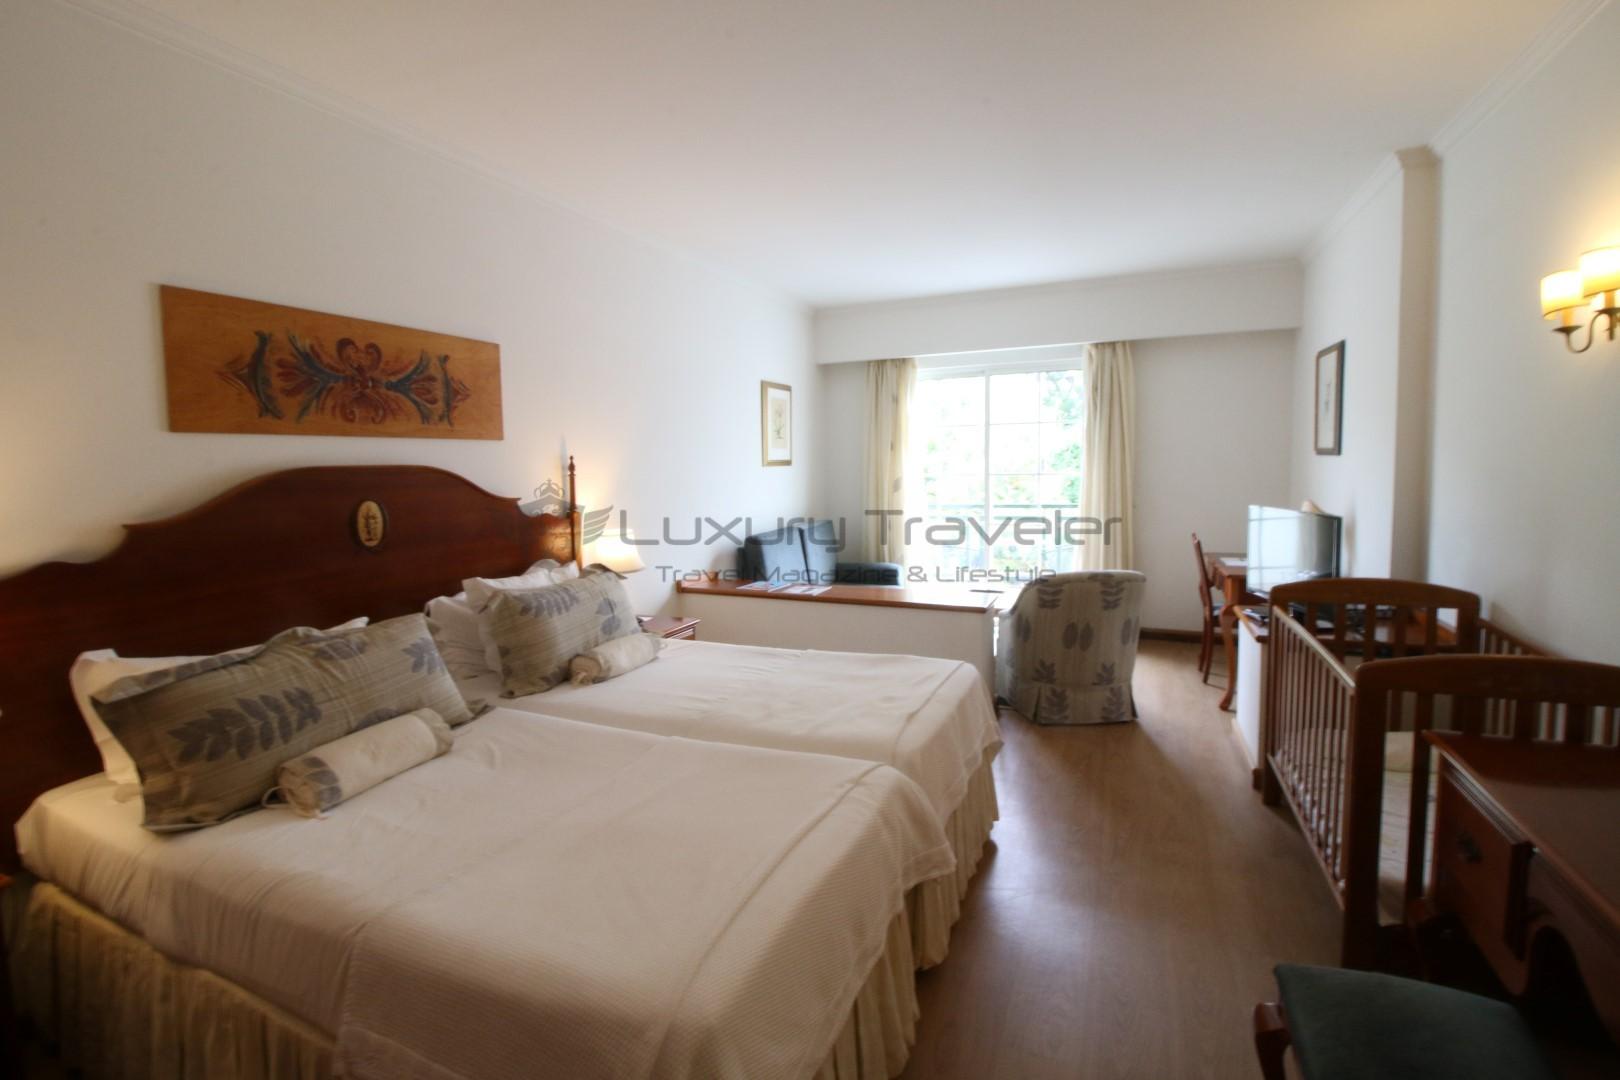 quintinha_sao_joao_funchal_madeira_hotel_bedroom